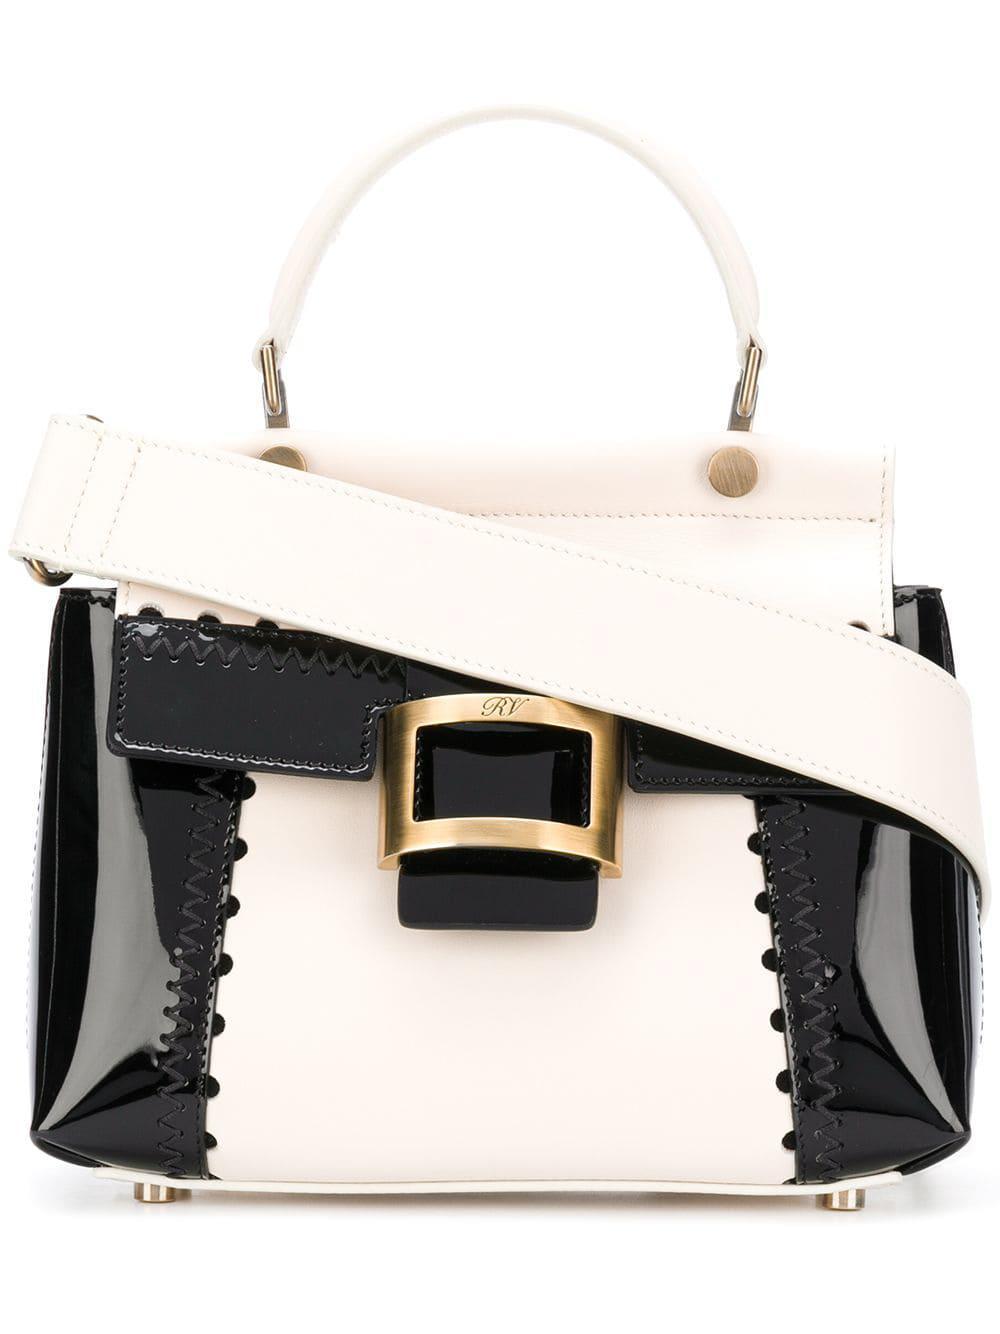 55515d420a Lyst - Roger Vivier Viv Cabas Mini Patent Leather Shoulder Bag in Black